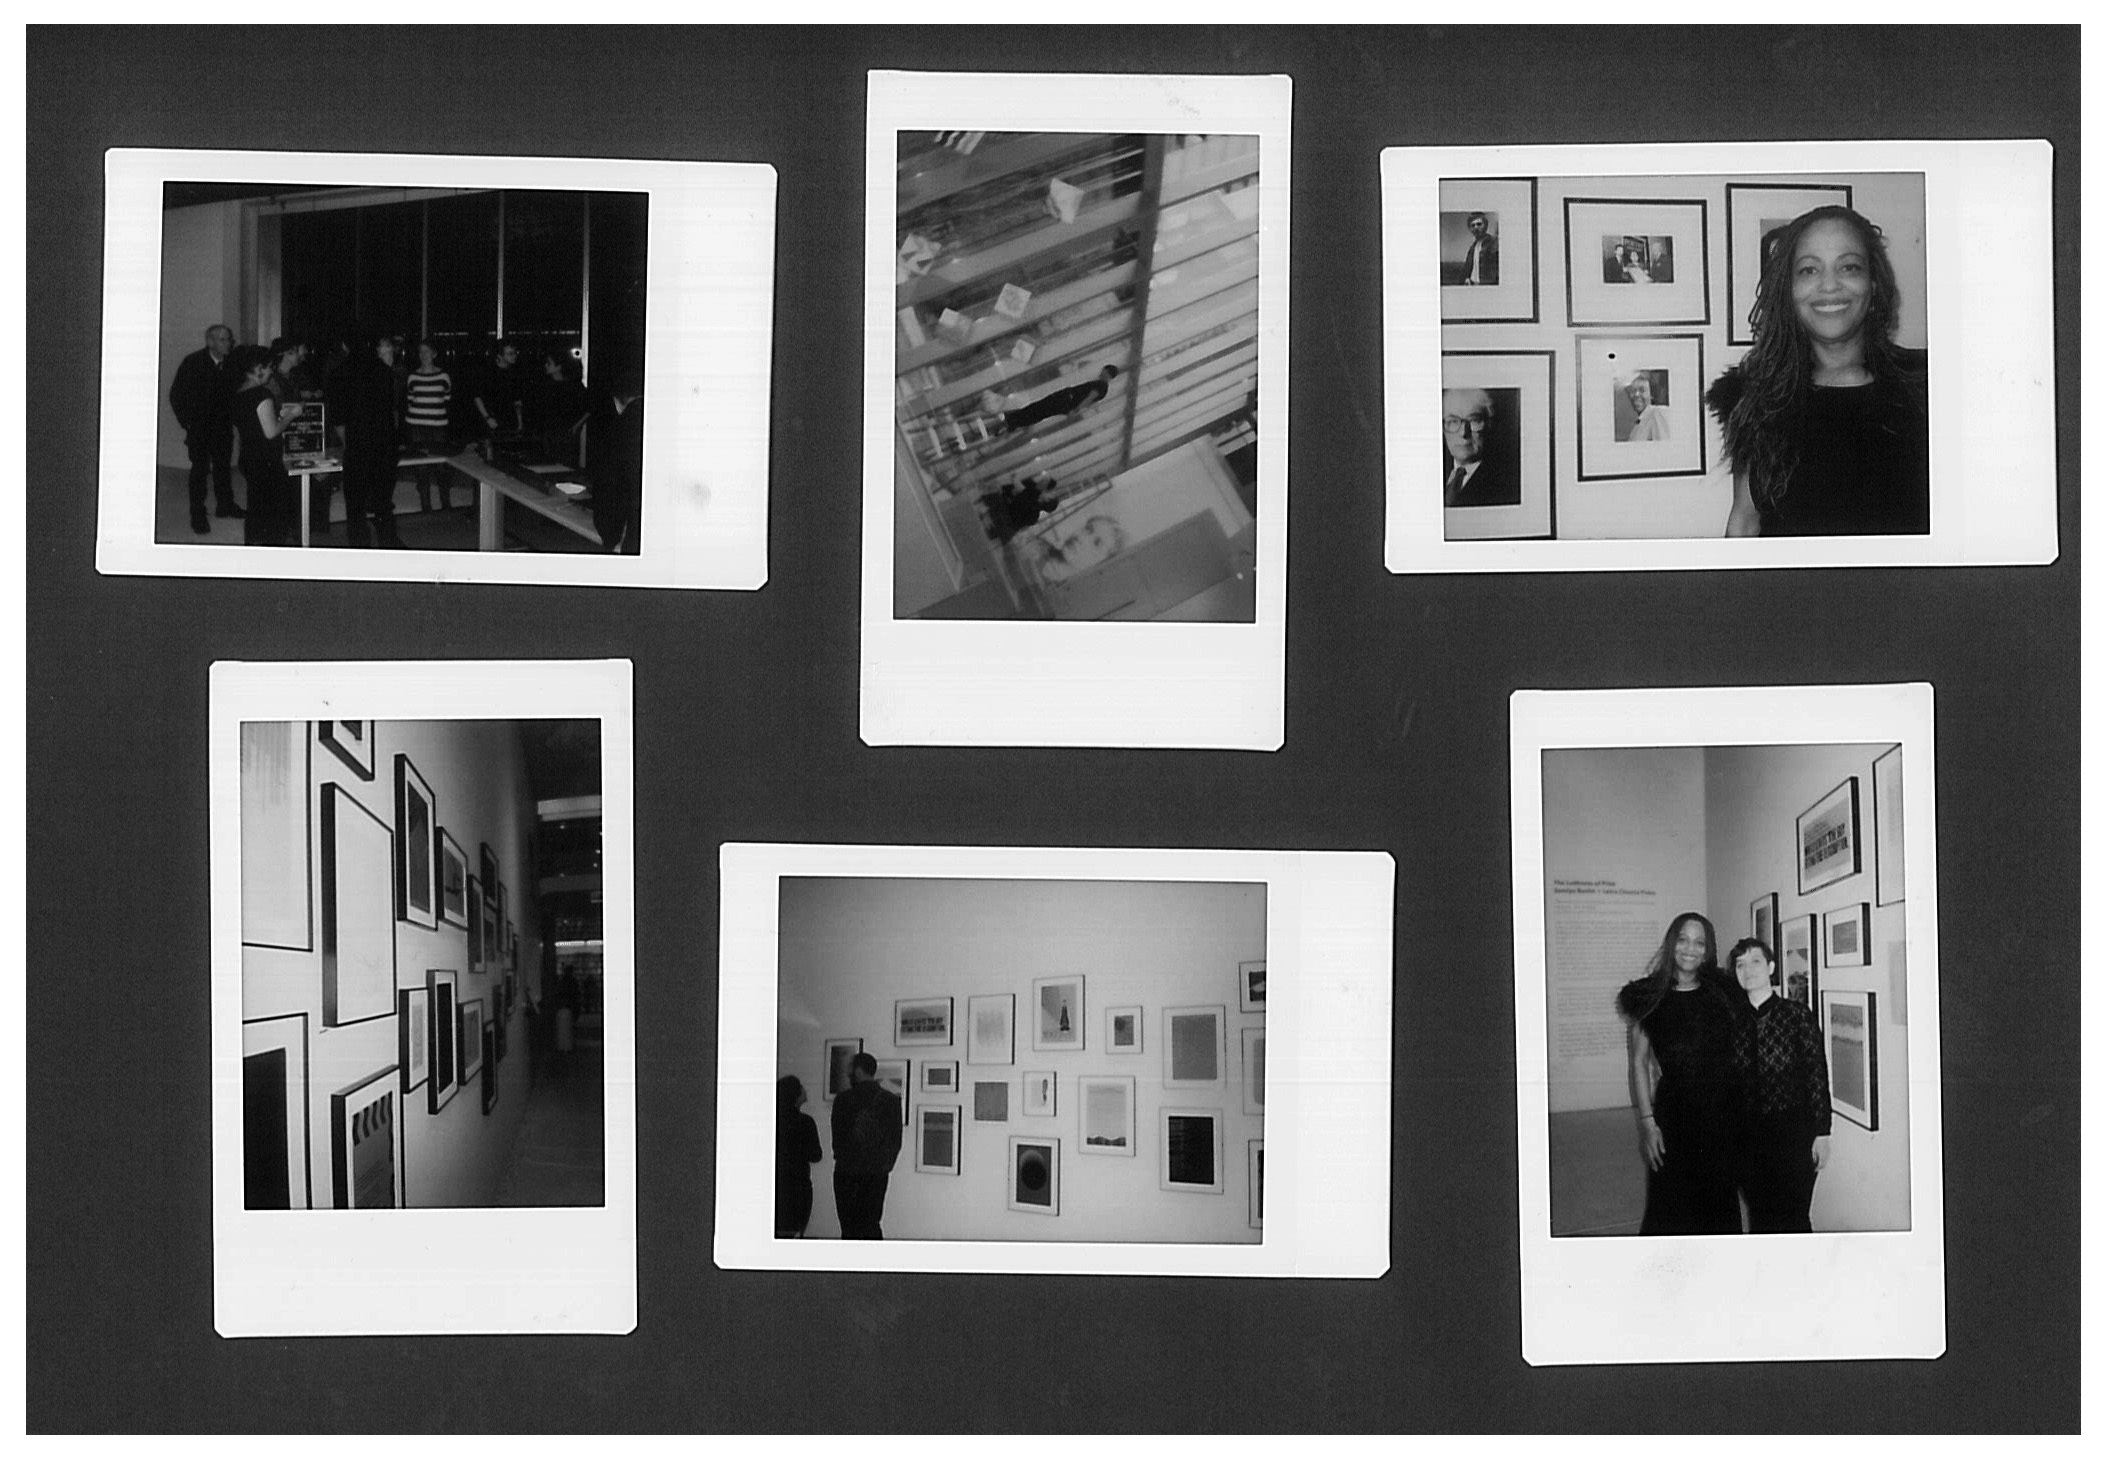 Polaroids of Professor Samiya Bashir and Daniela del Mar setting up the exhibit  The Lushness of Print   Photos courtesy of Samiya Bashir